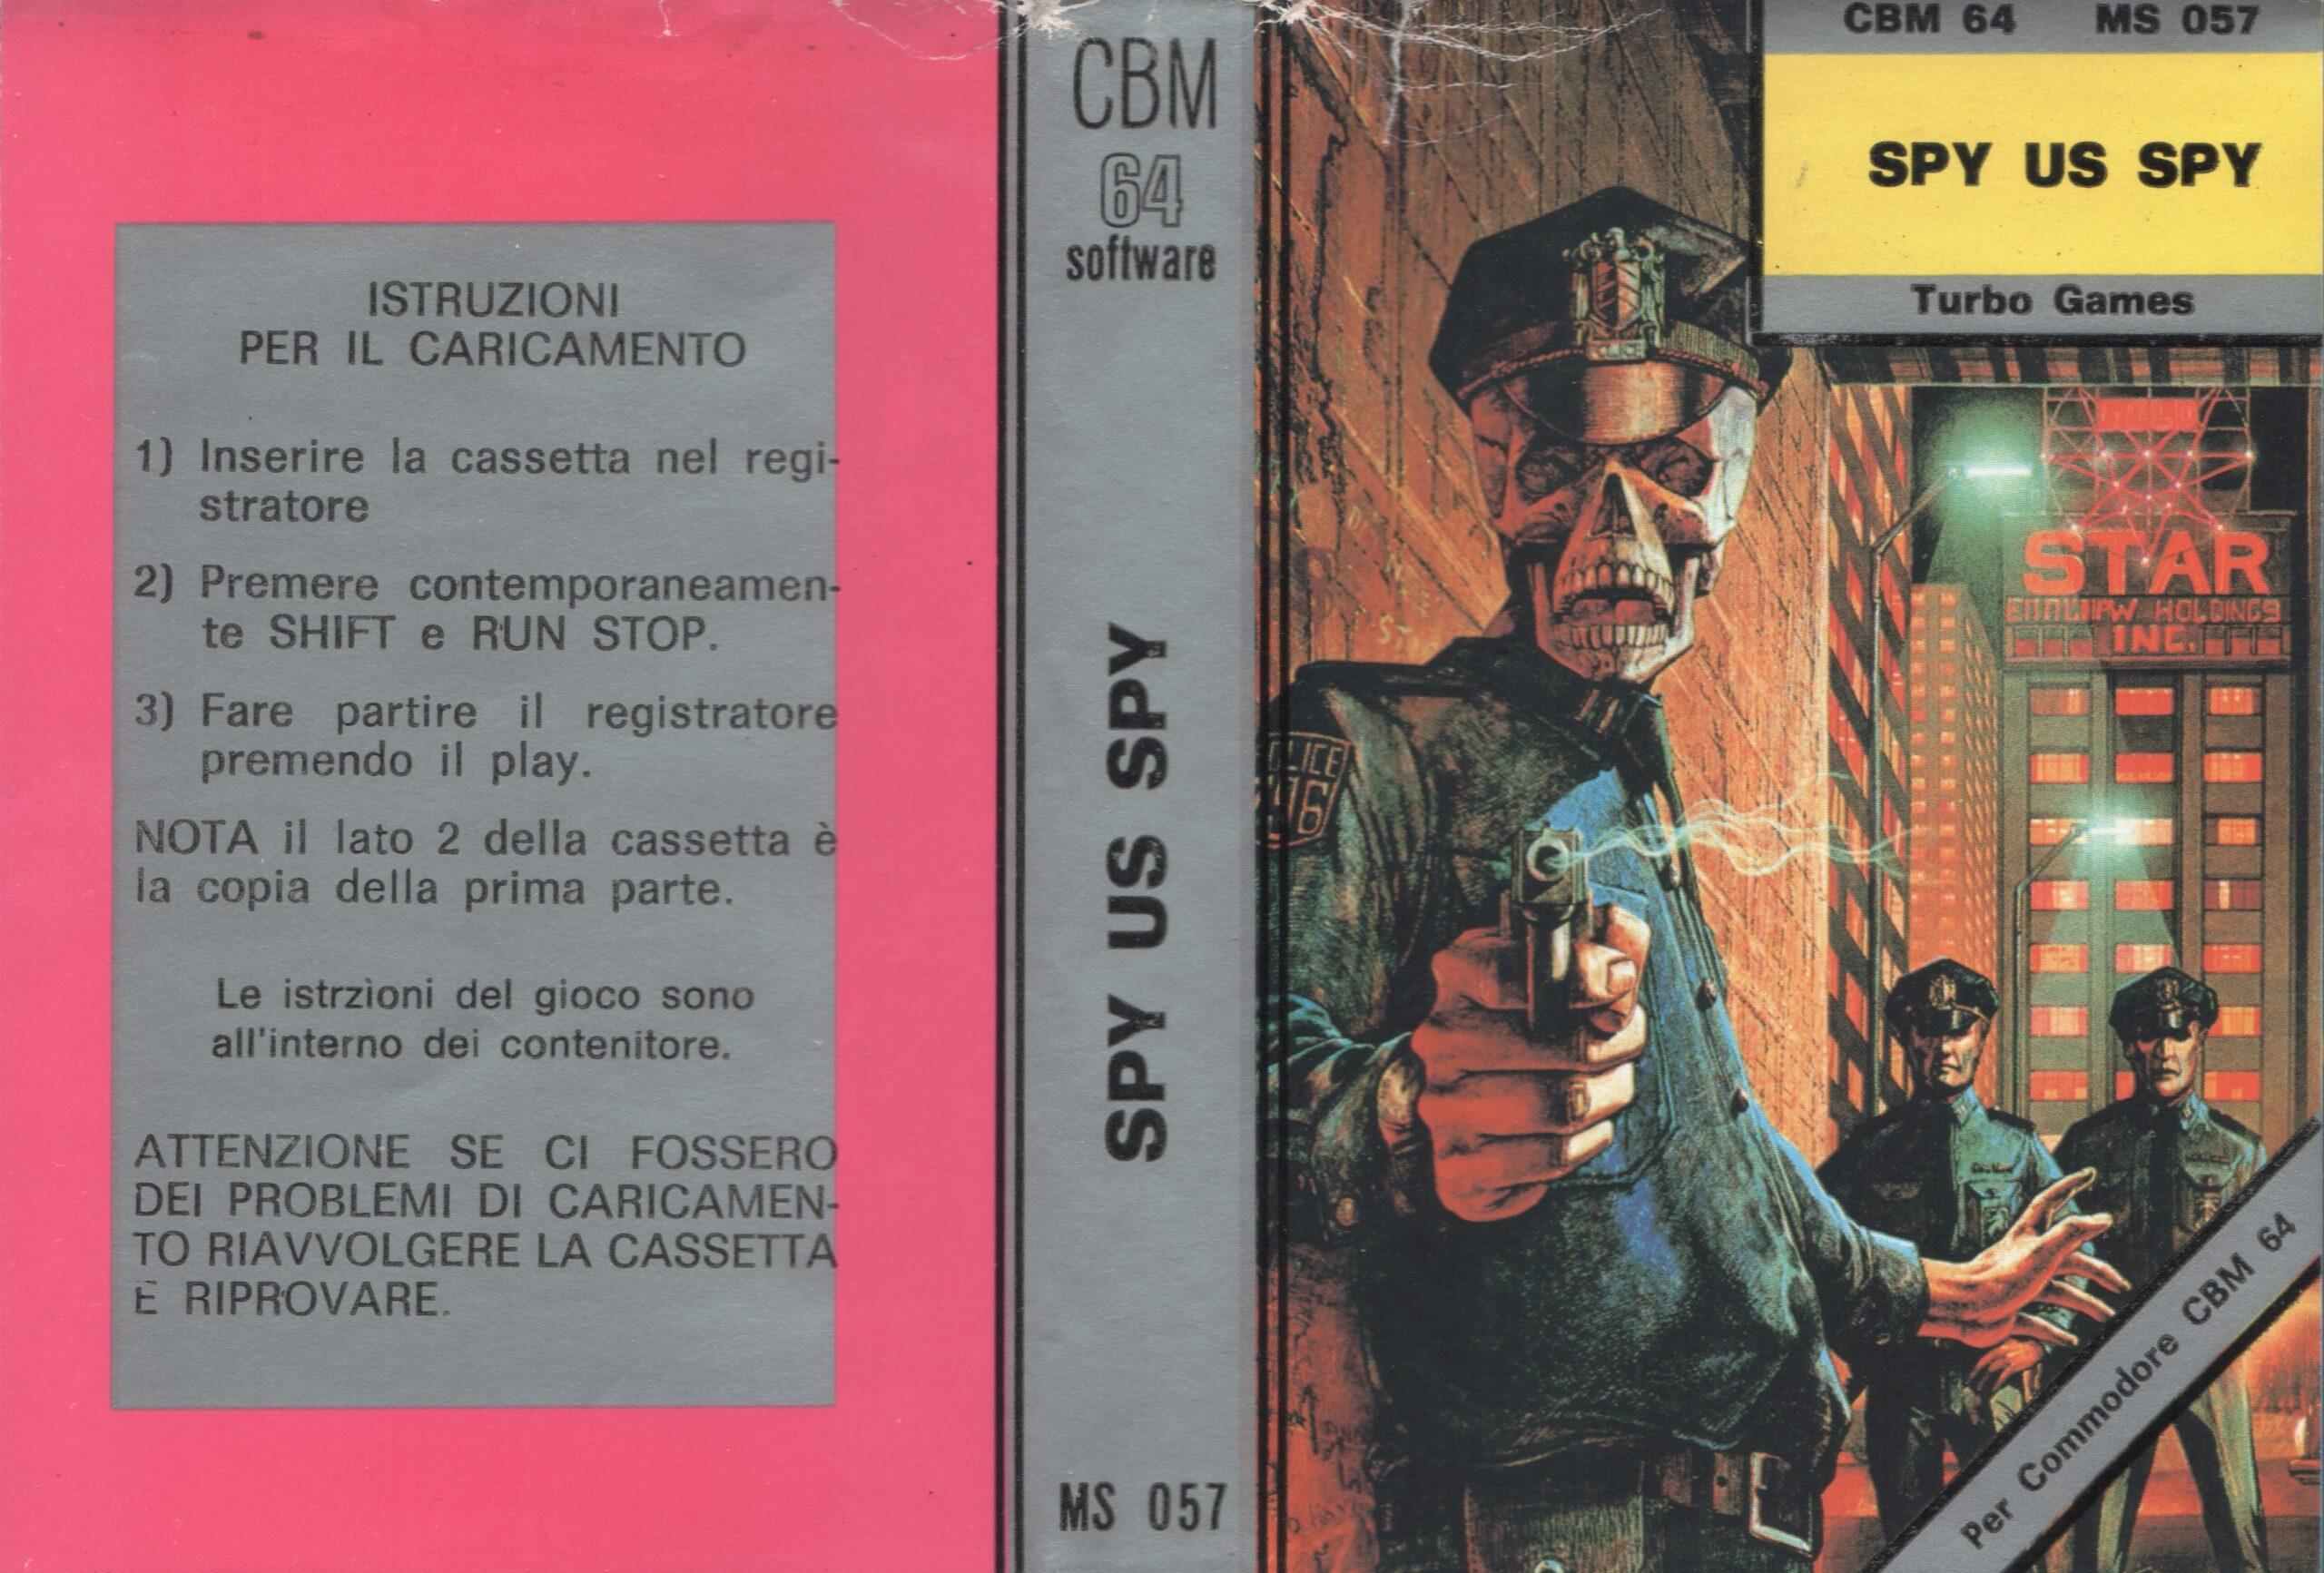 SPY US SPY MS 057